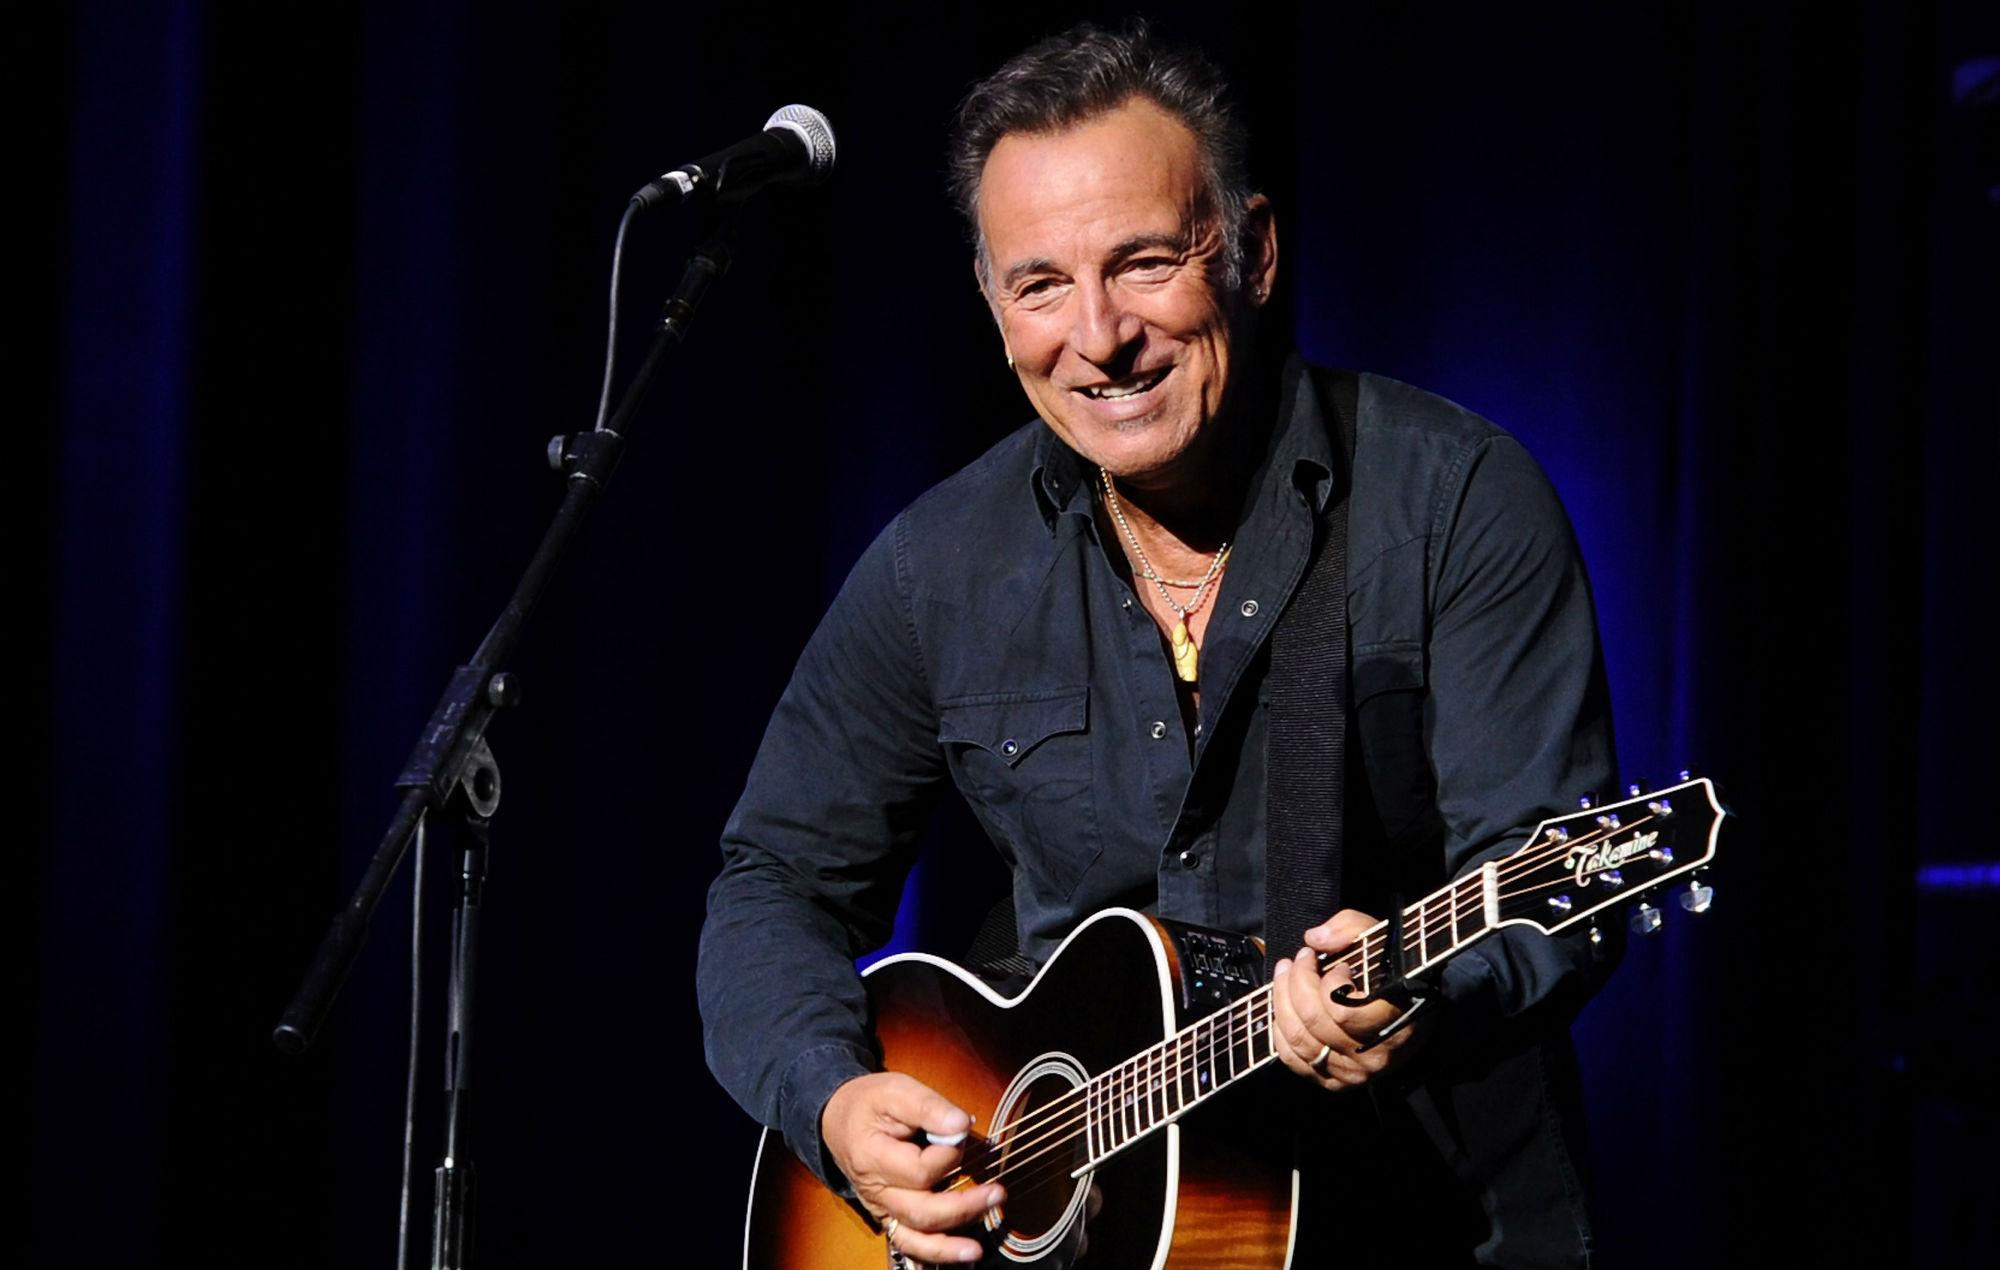 Bruce Springsteen on broadway album